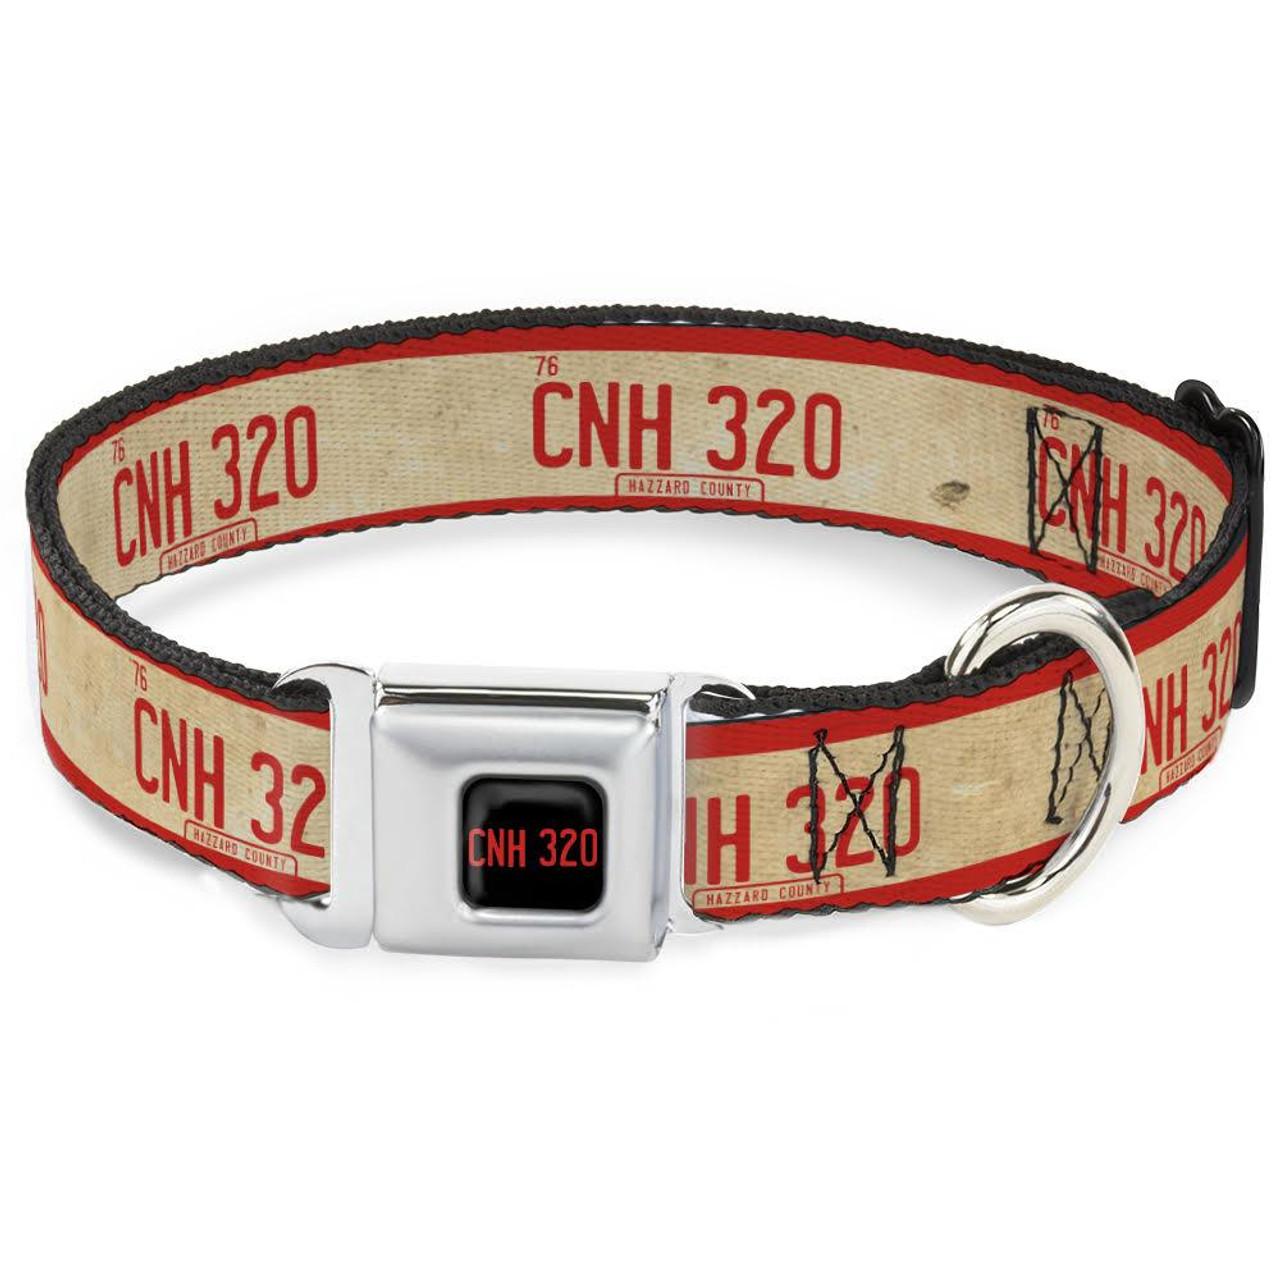 CNH-320 General Lee  Dog Collar